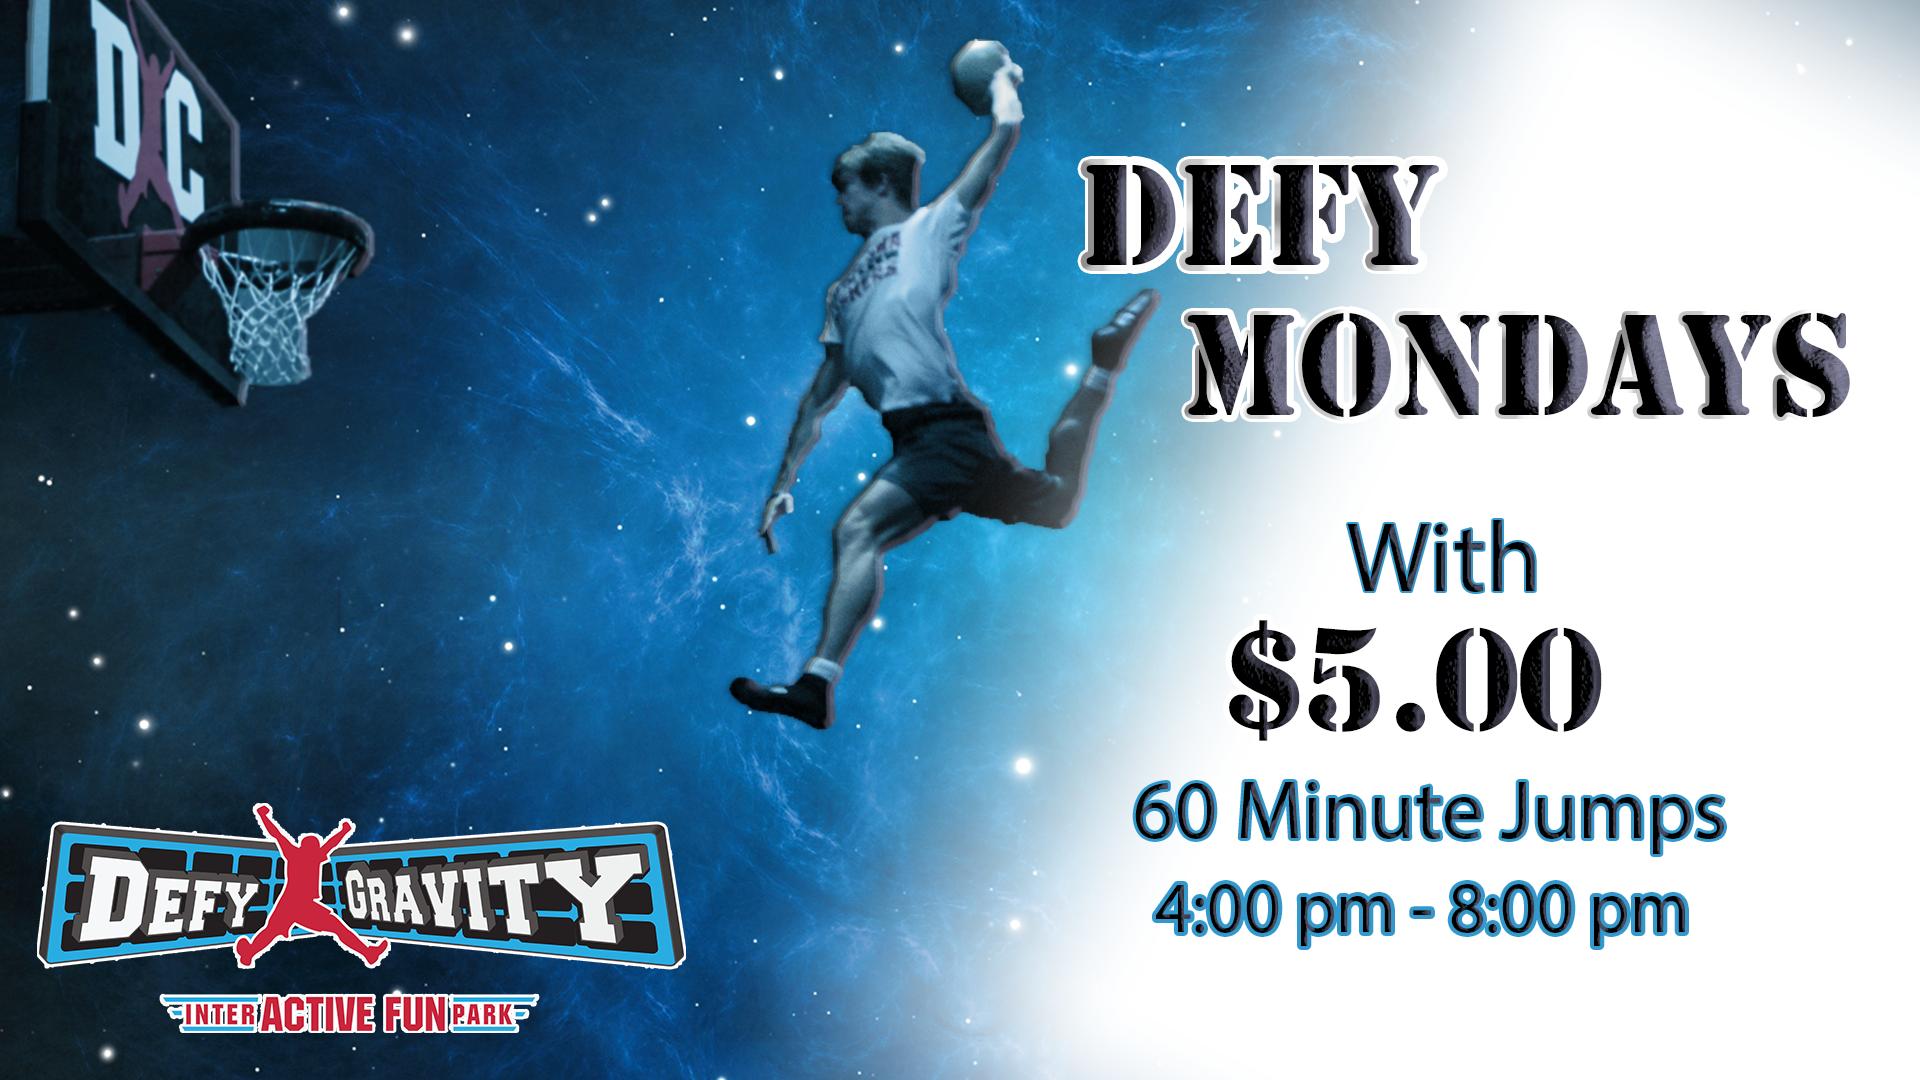 $5.00 Jump Night